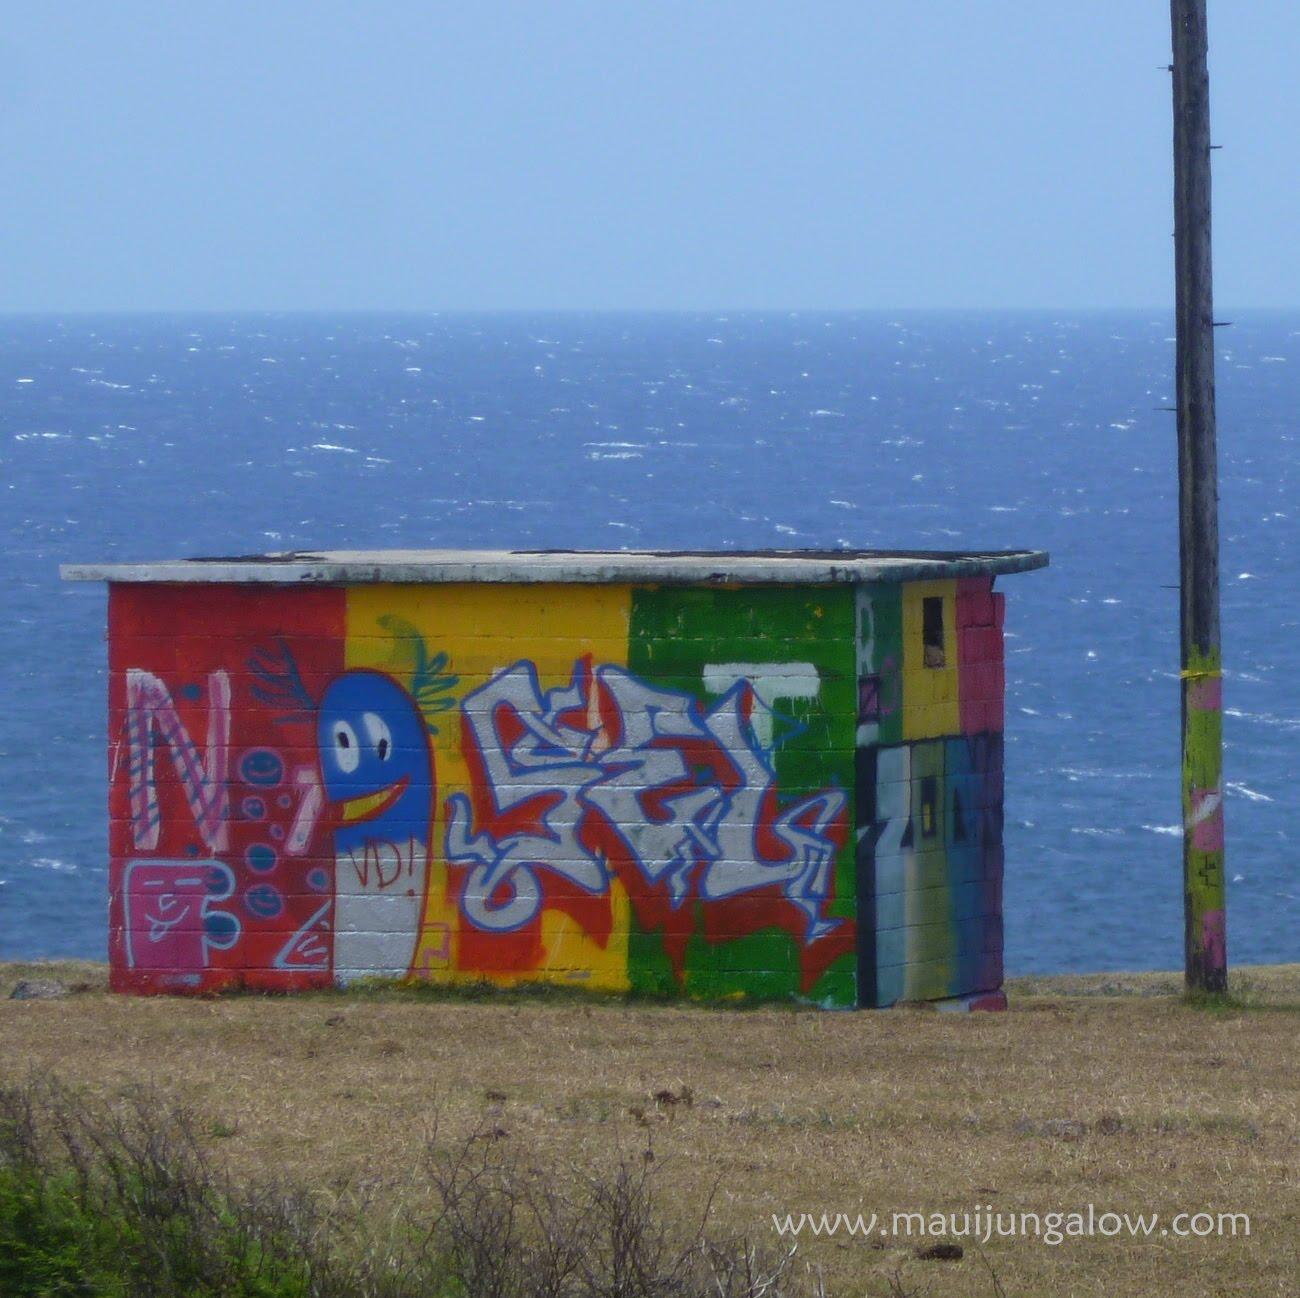 Maui Jungalow Groovy Tuesday Graffiti And Graduation Street Art